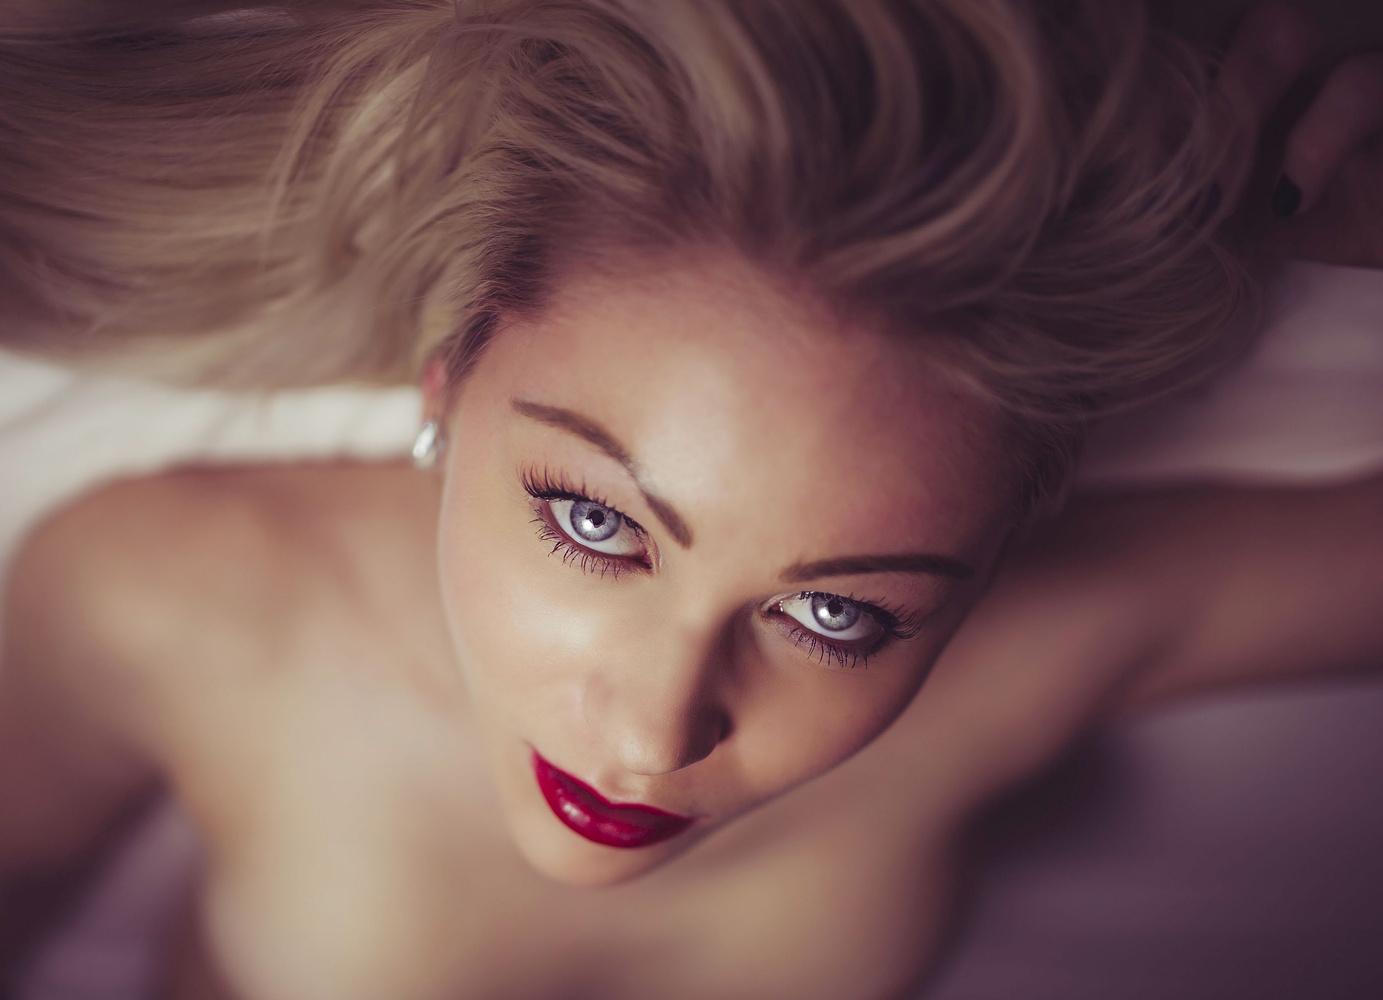 Blue Eyes, 2 by Ian Pettigrew